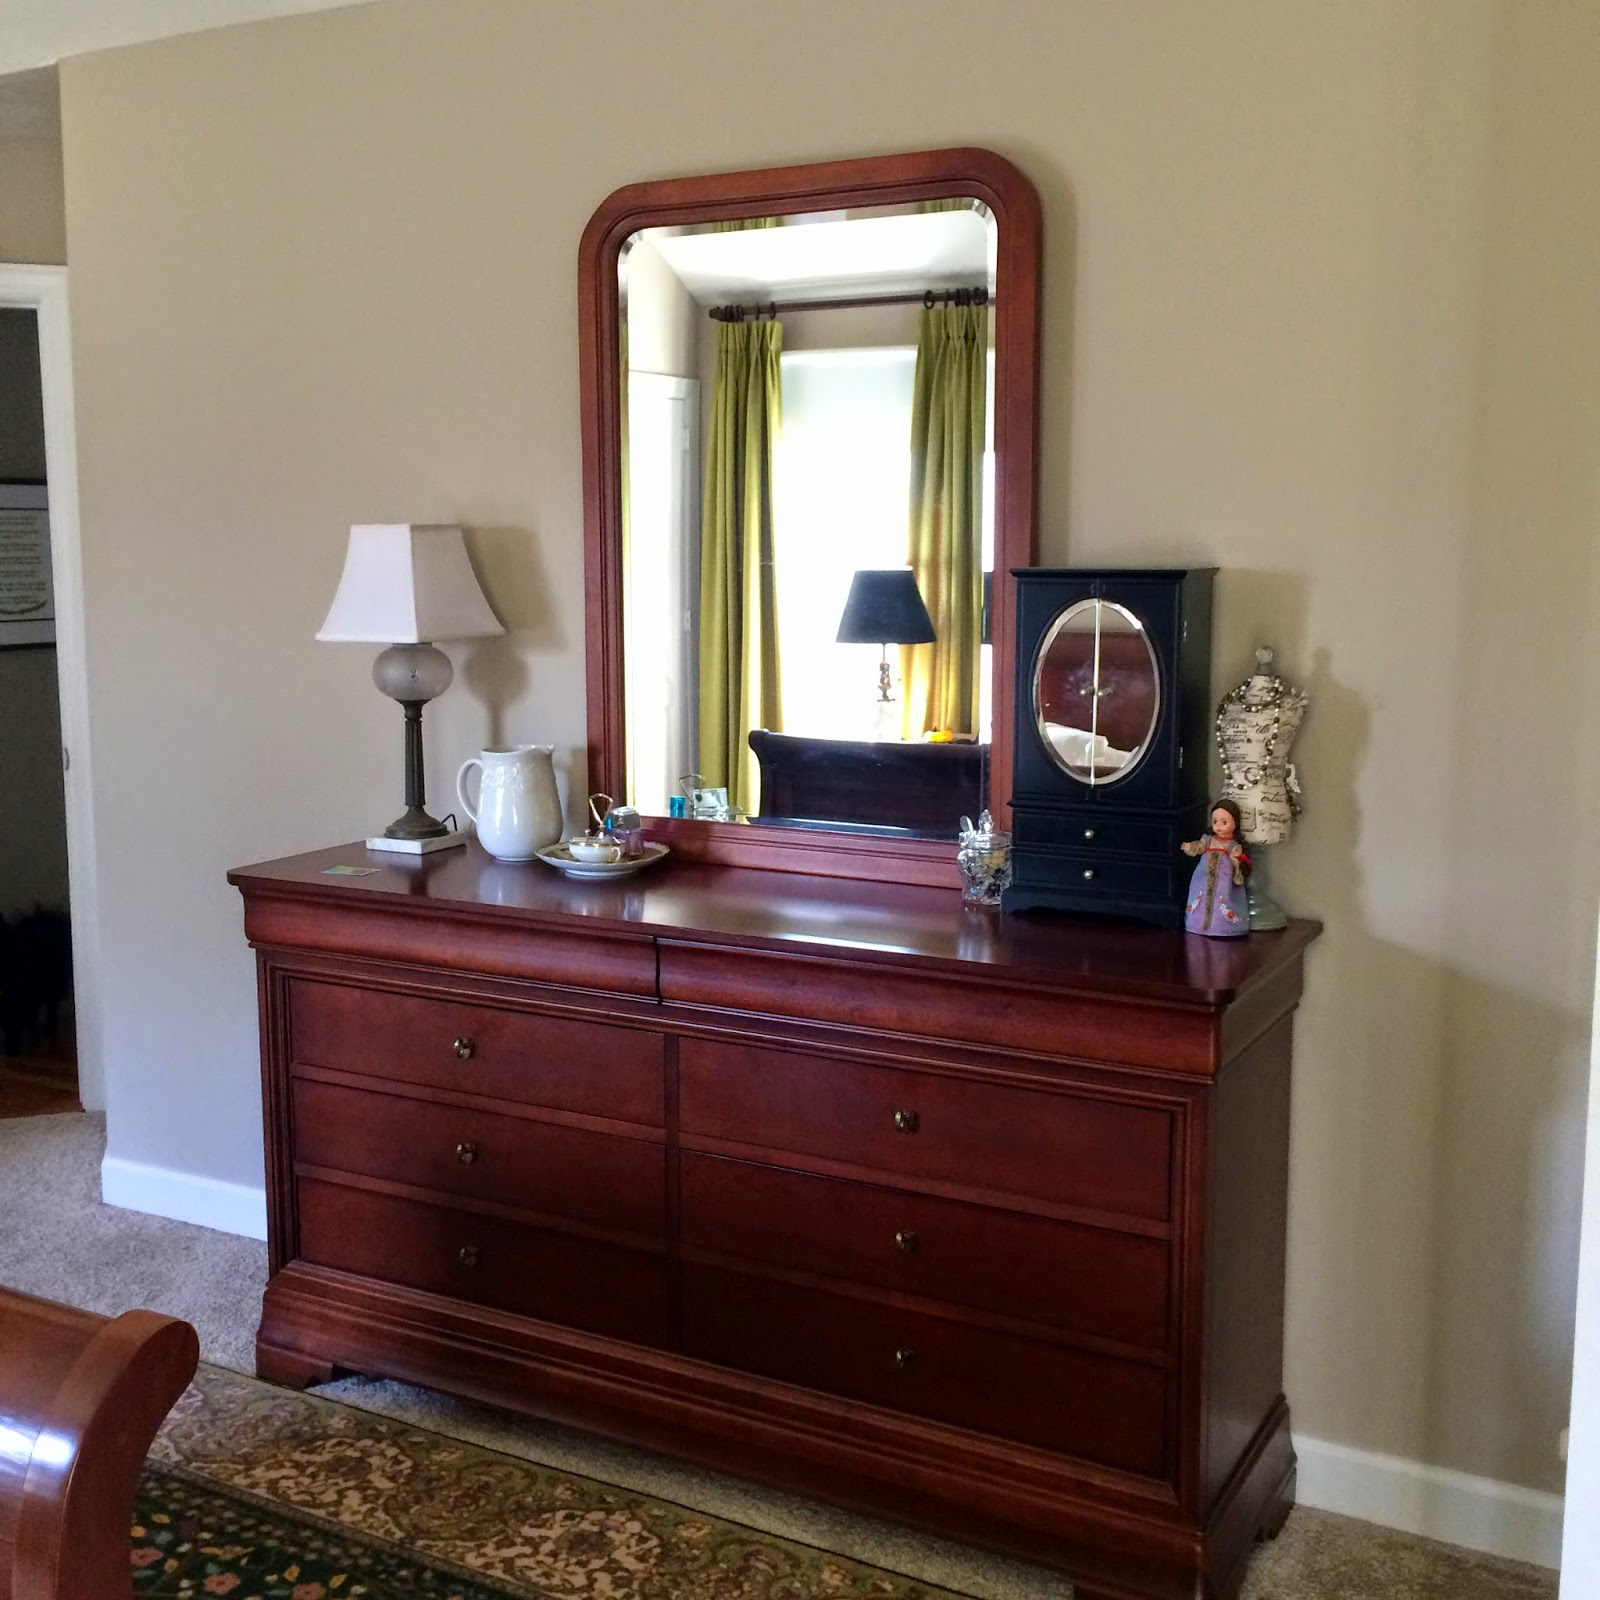 craigslist bedroom set at home and interior design ideas